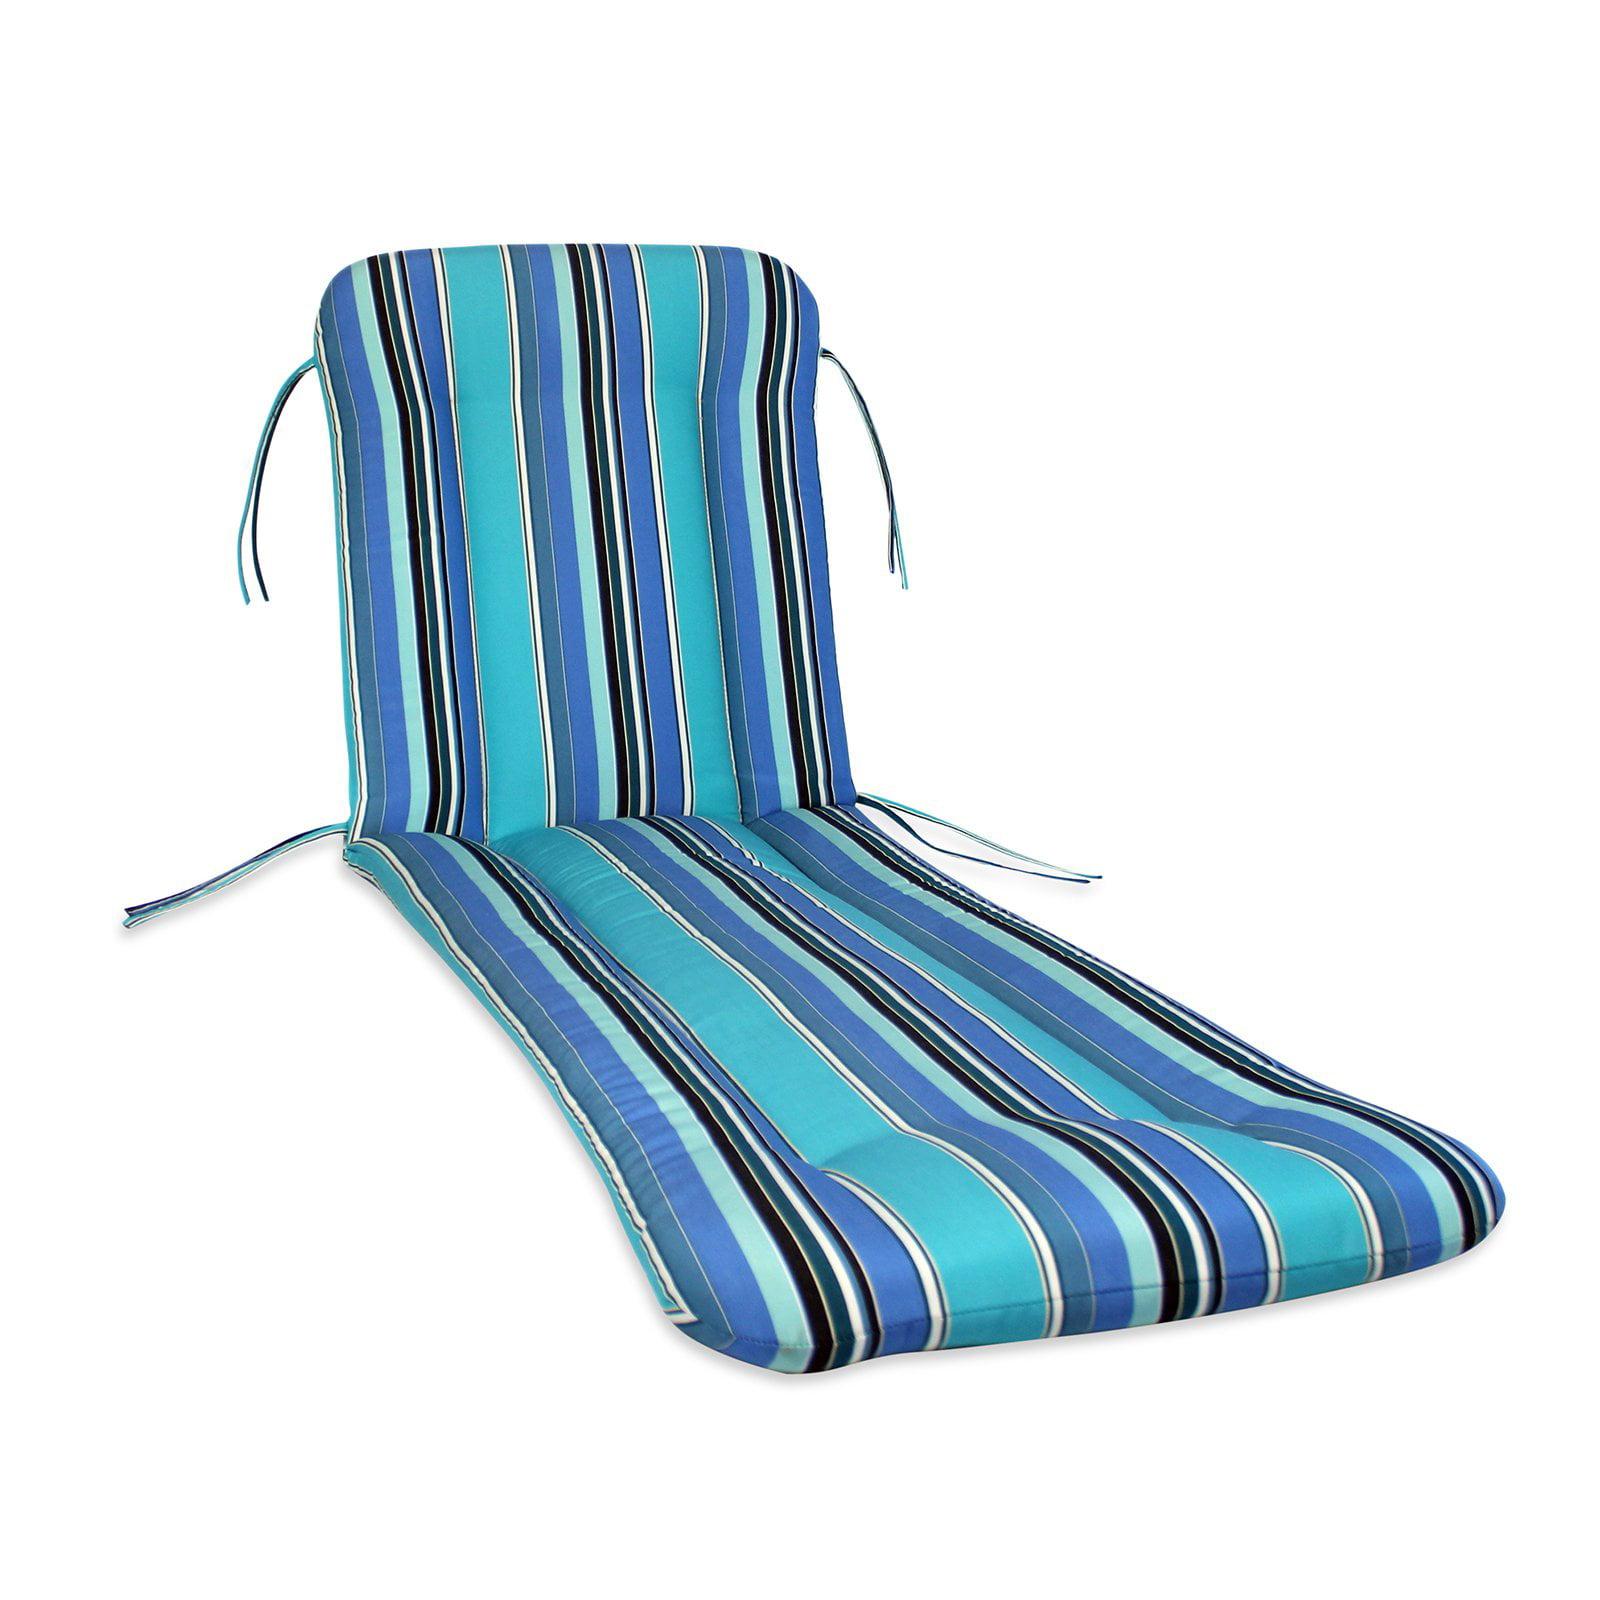 Comfort Classics Sunbrella Chaise Lounge Cushion